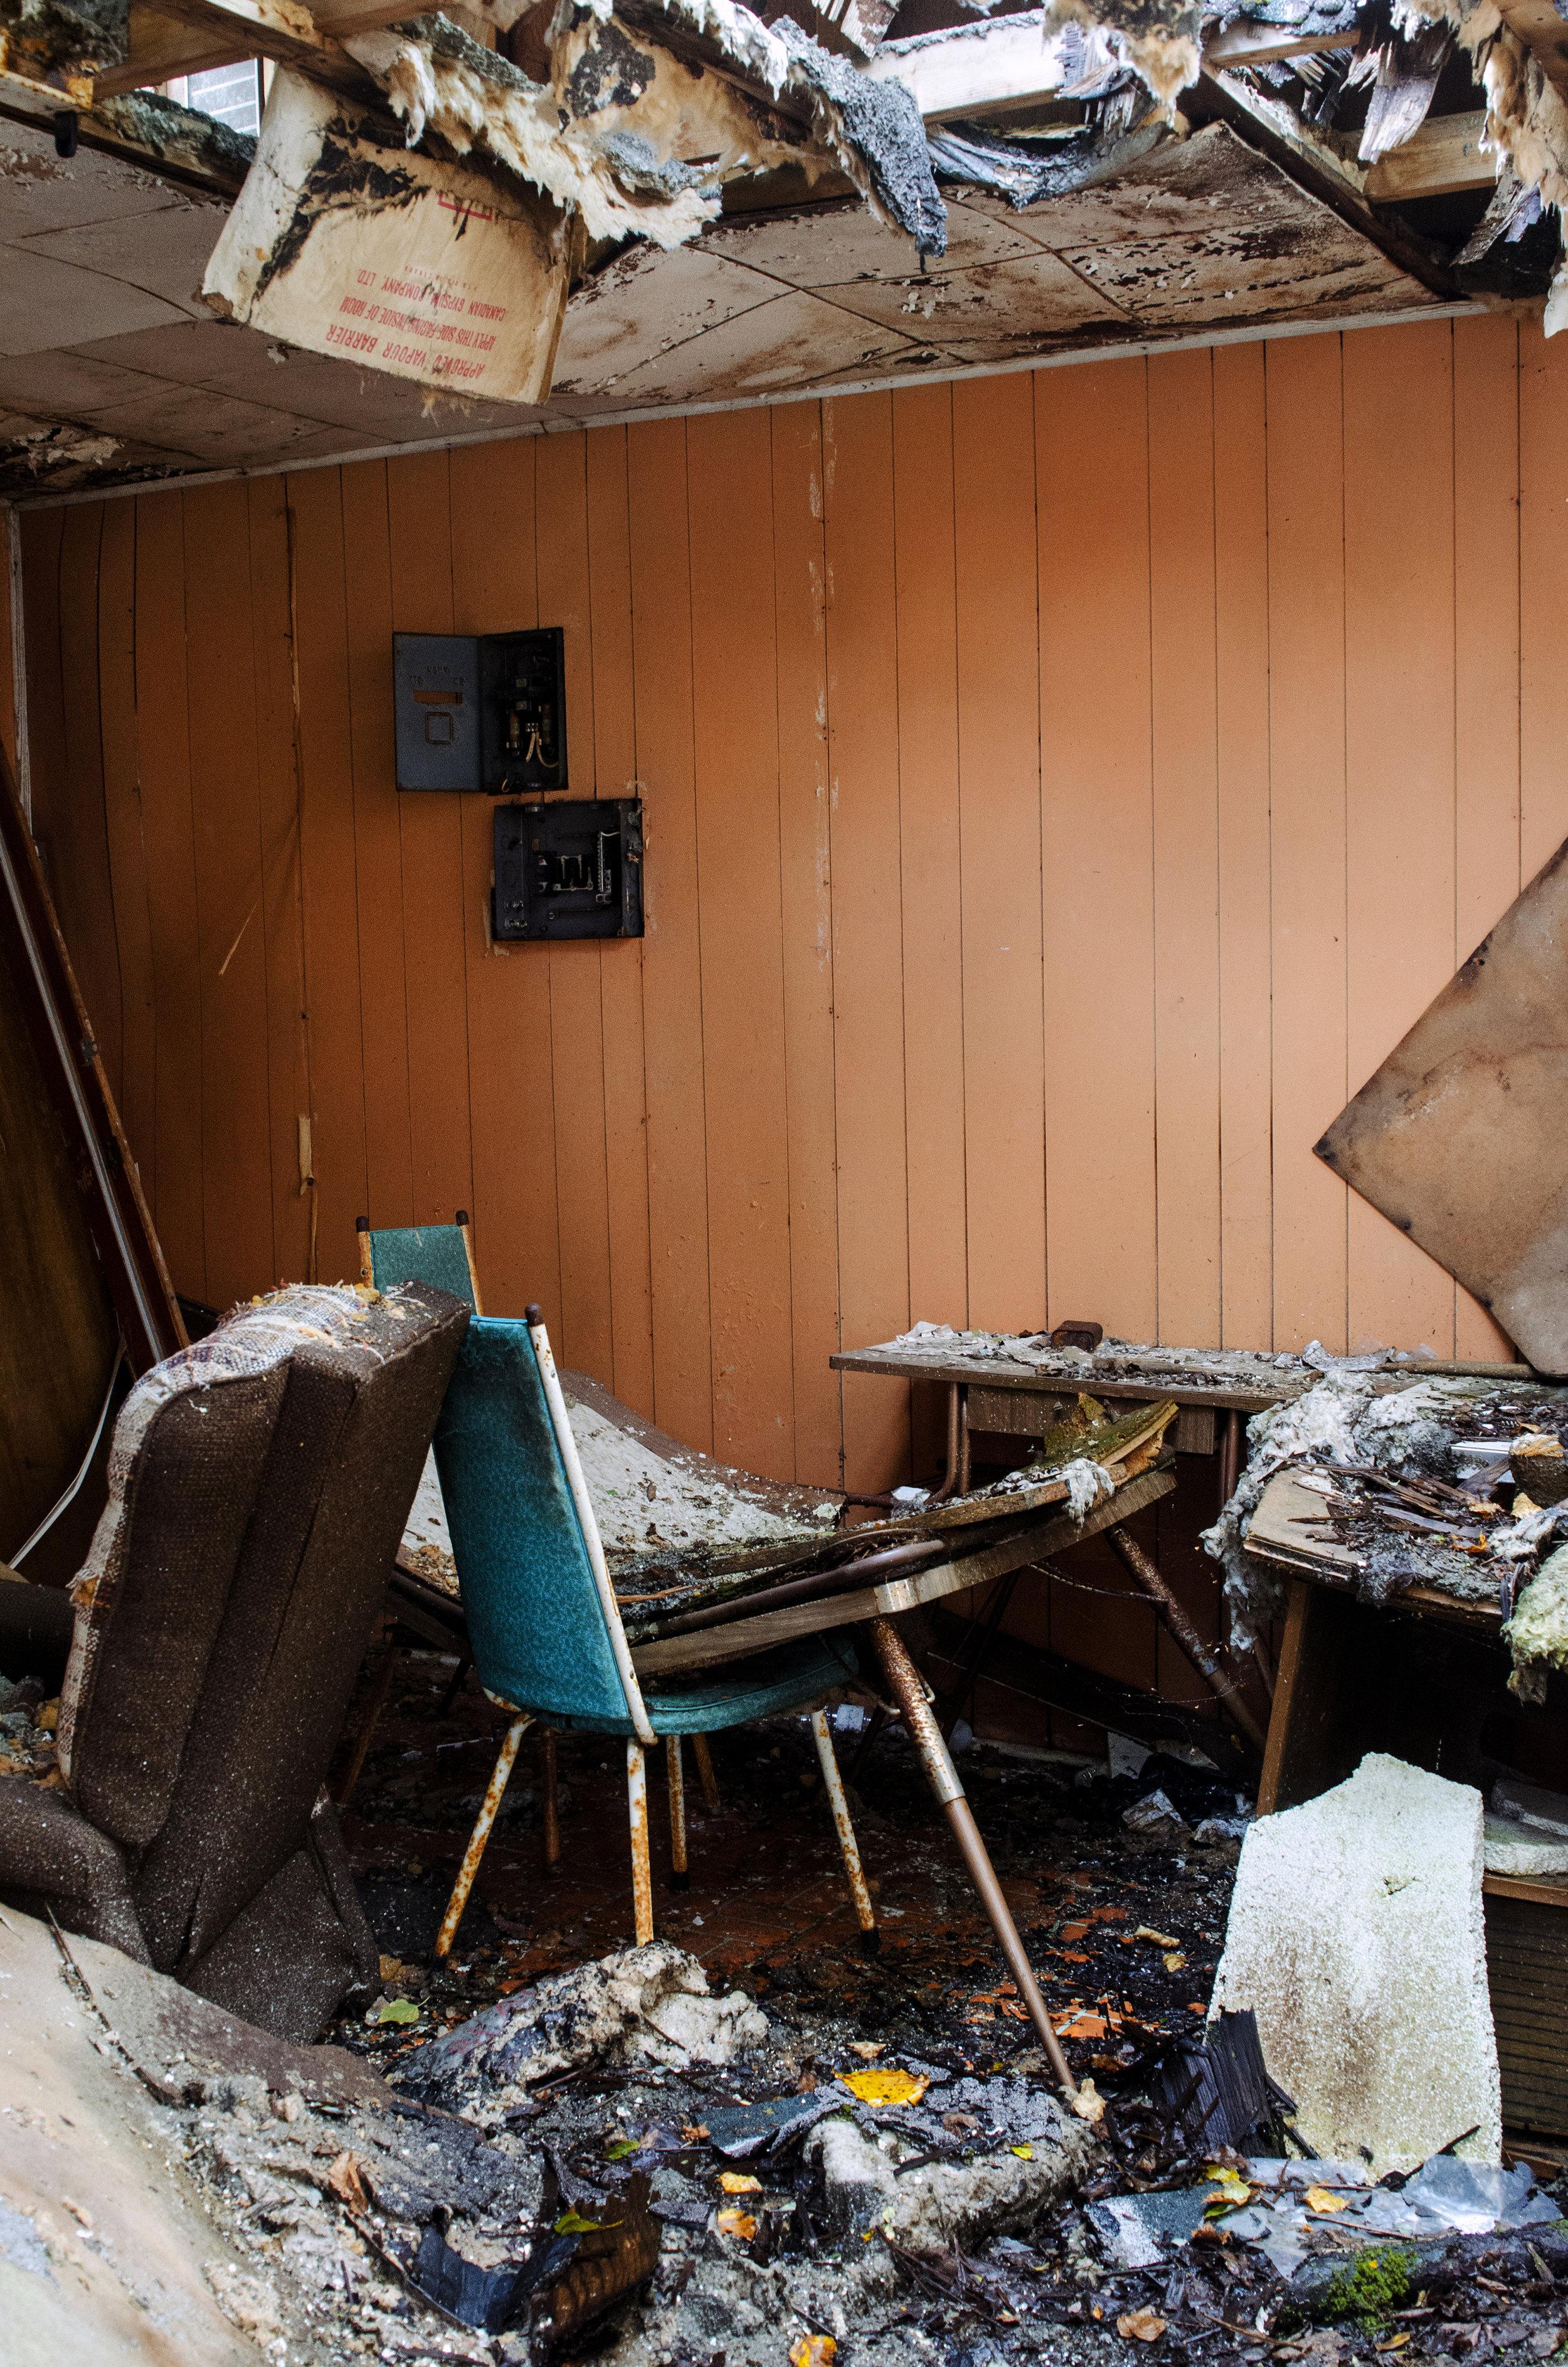 Jenkins, Cheyenne. Fallen Ceiling. 2017. Digital Photography. Wawa, Ontario